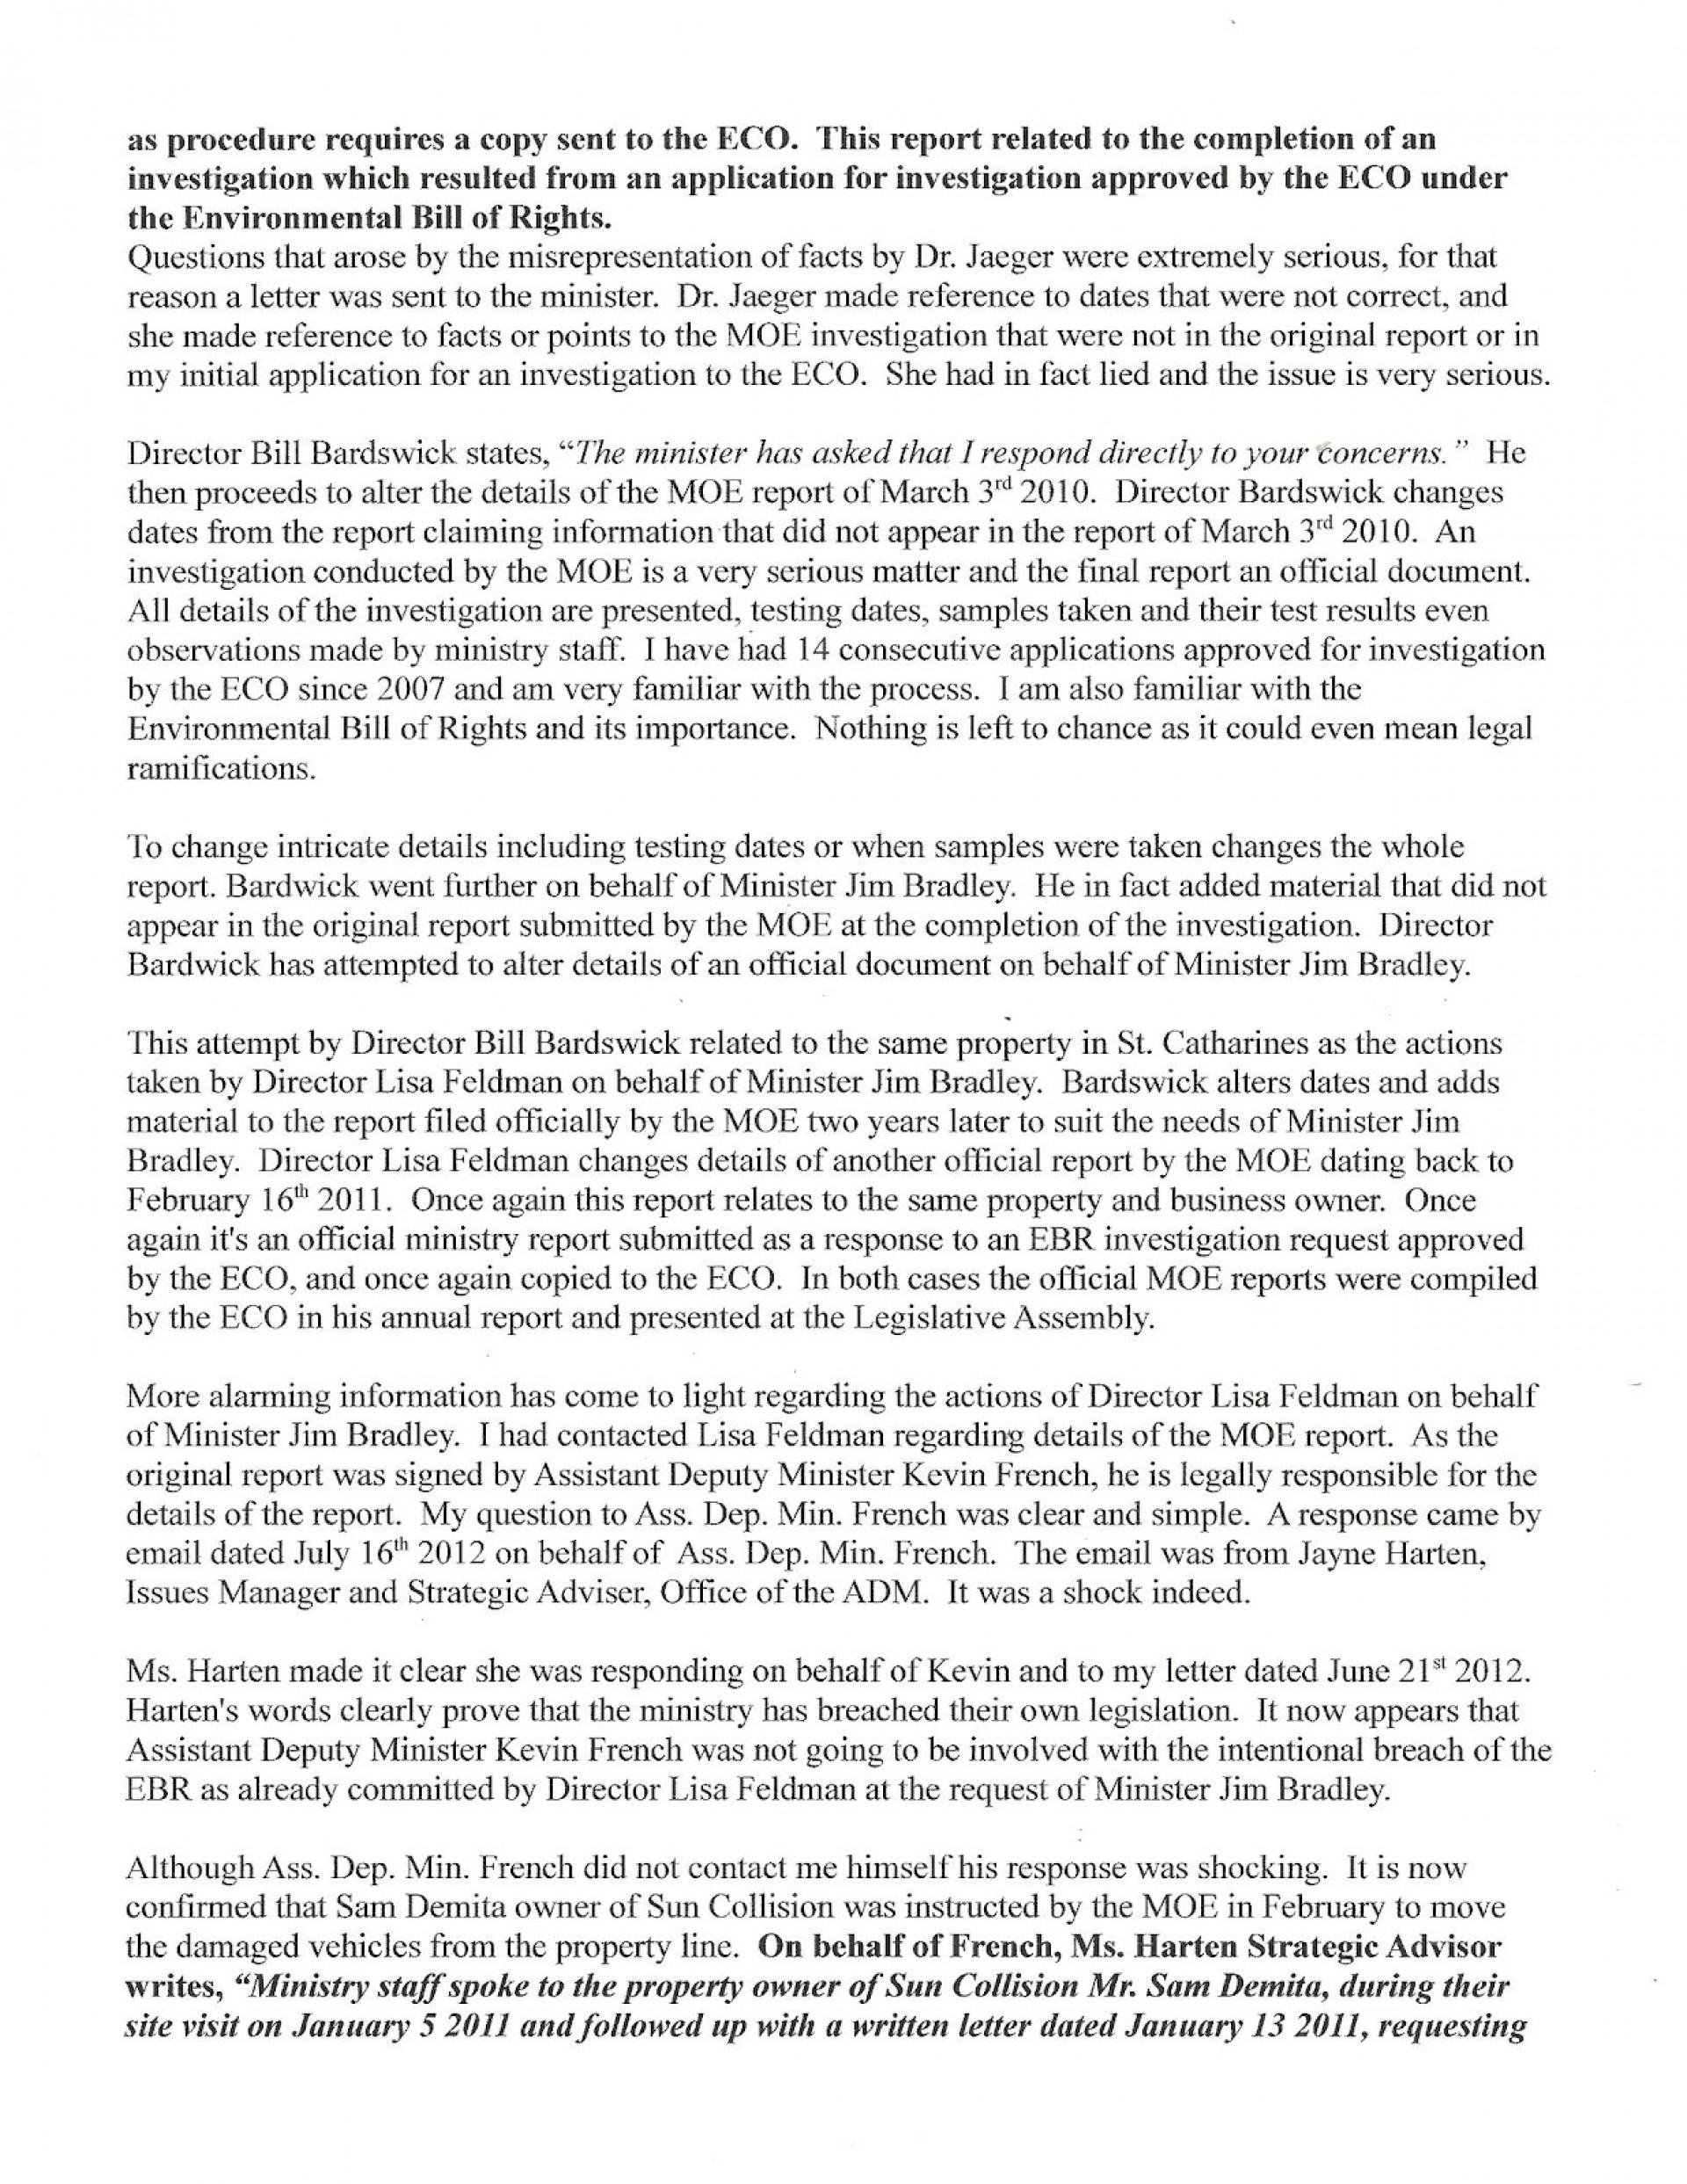 016 Ombudsmanletter2 Essay Example National Honor Society Sensational Application Junior Ideas Examples 1920